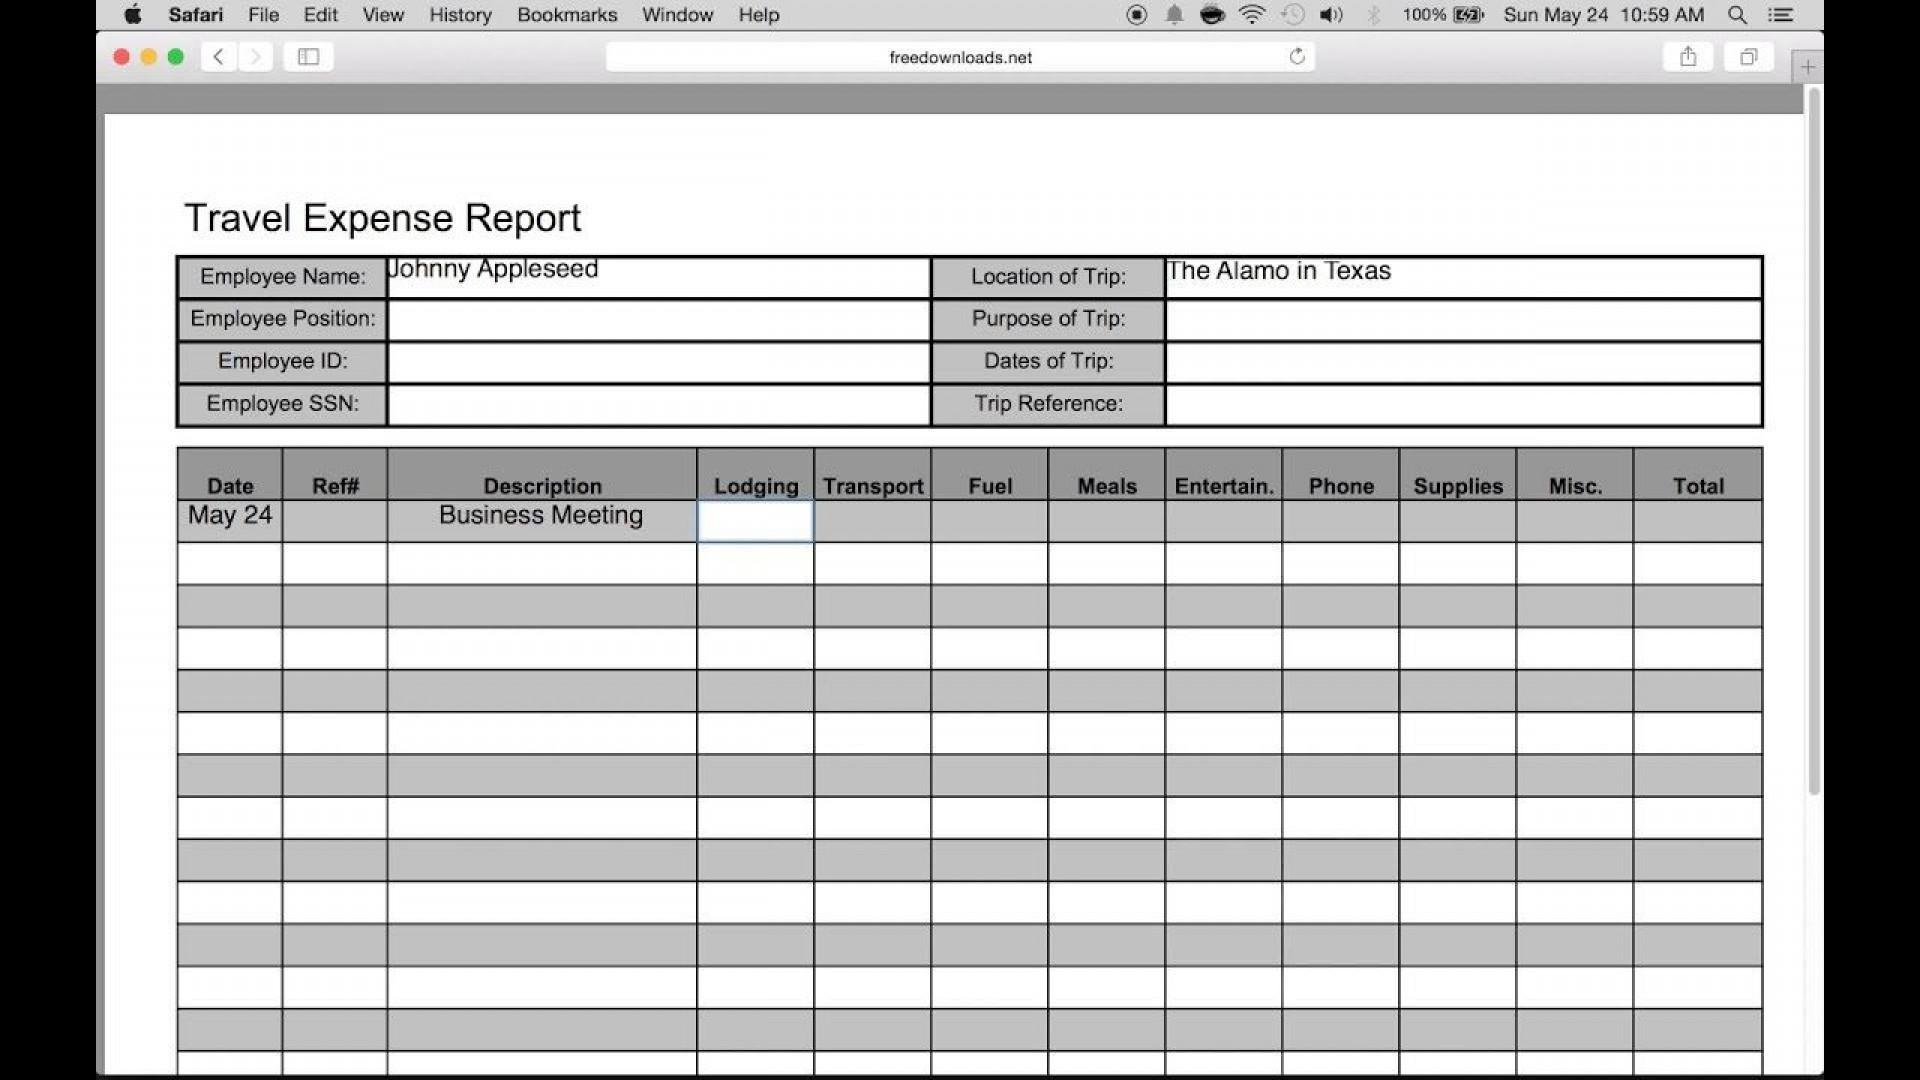 007 Wondrou Travel Expense Report Template Sample  Google Sheet Free Form Pdf1920